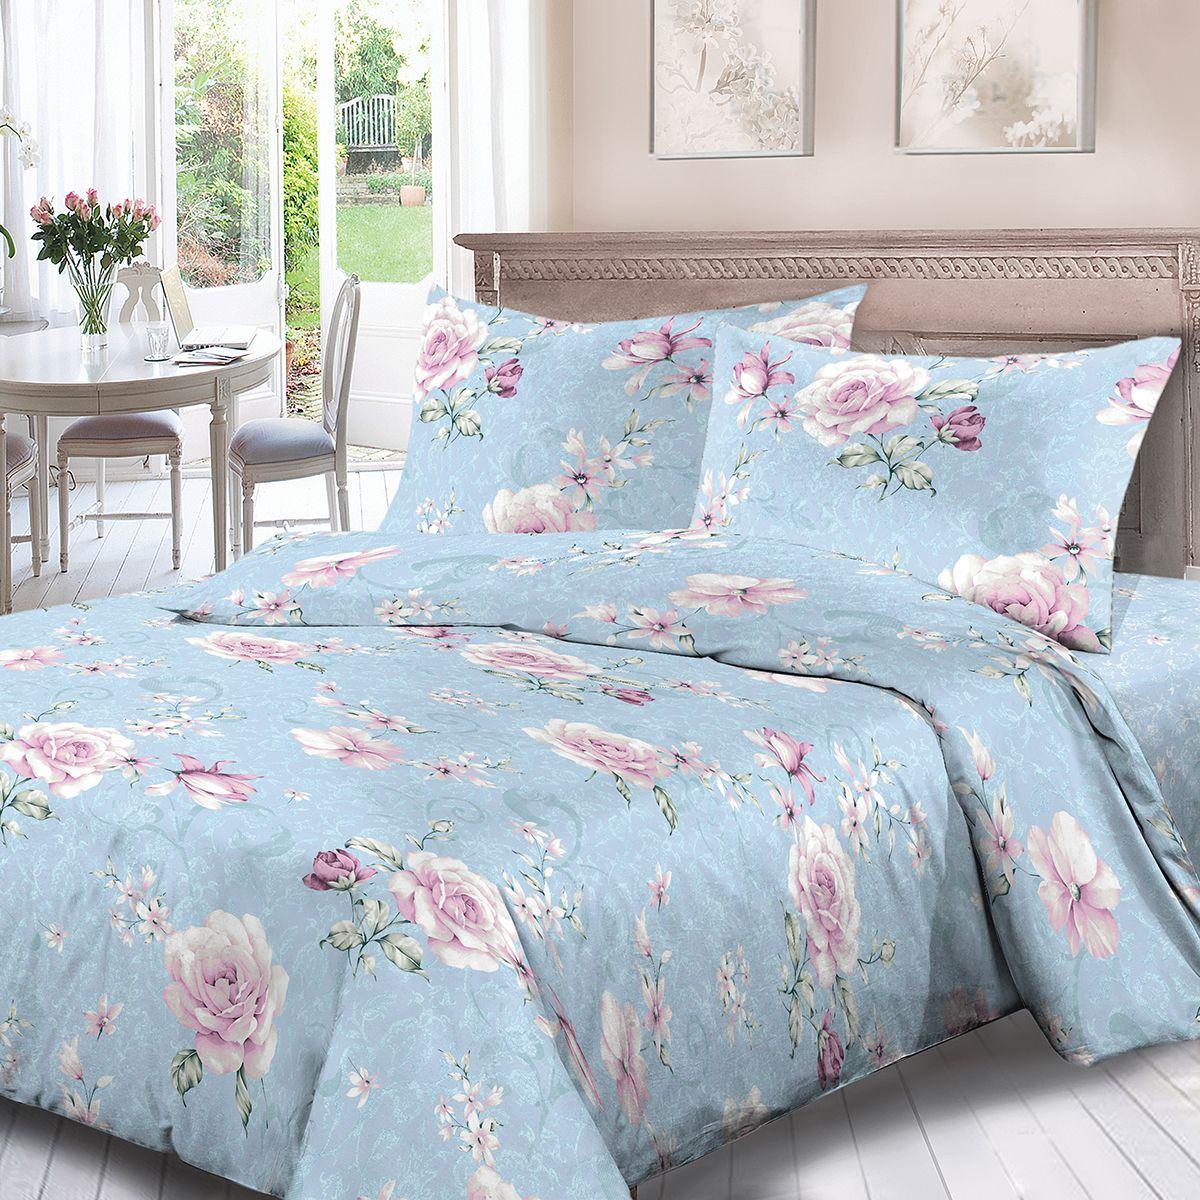 Комплект белья Для Снов Алемана, 2-х спальное, наволочки 70x70, цвет: голубой. 3792-186499